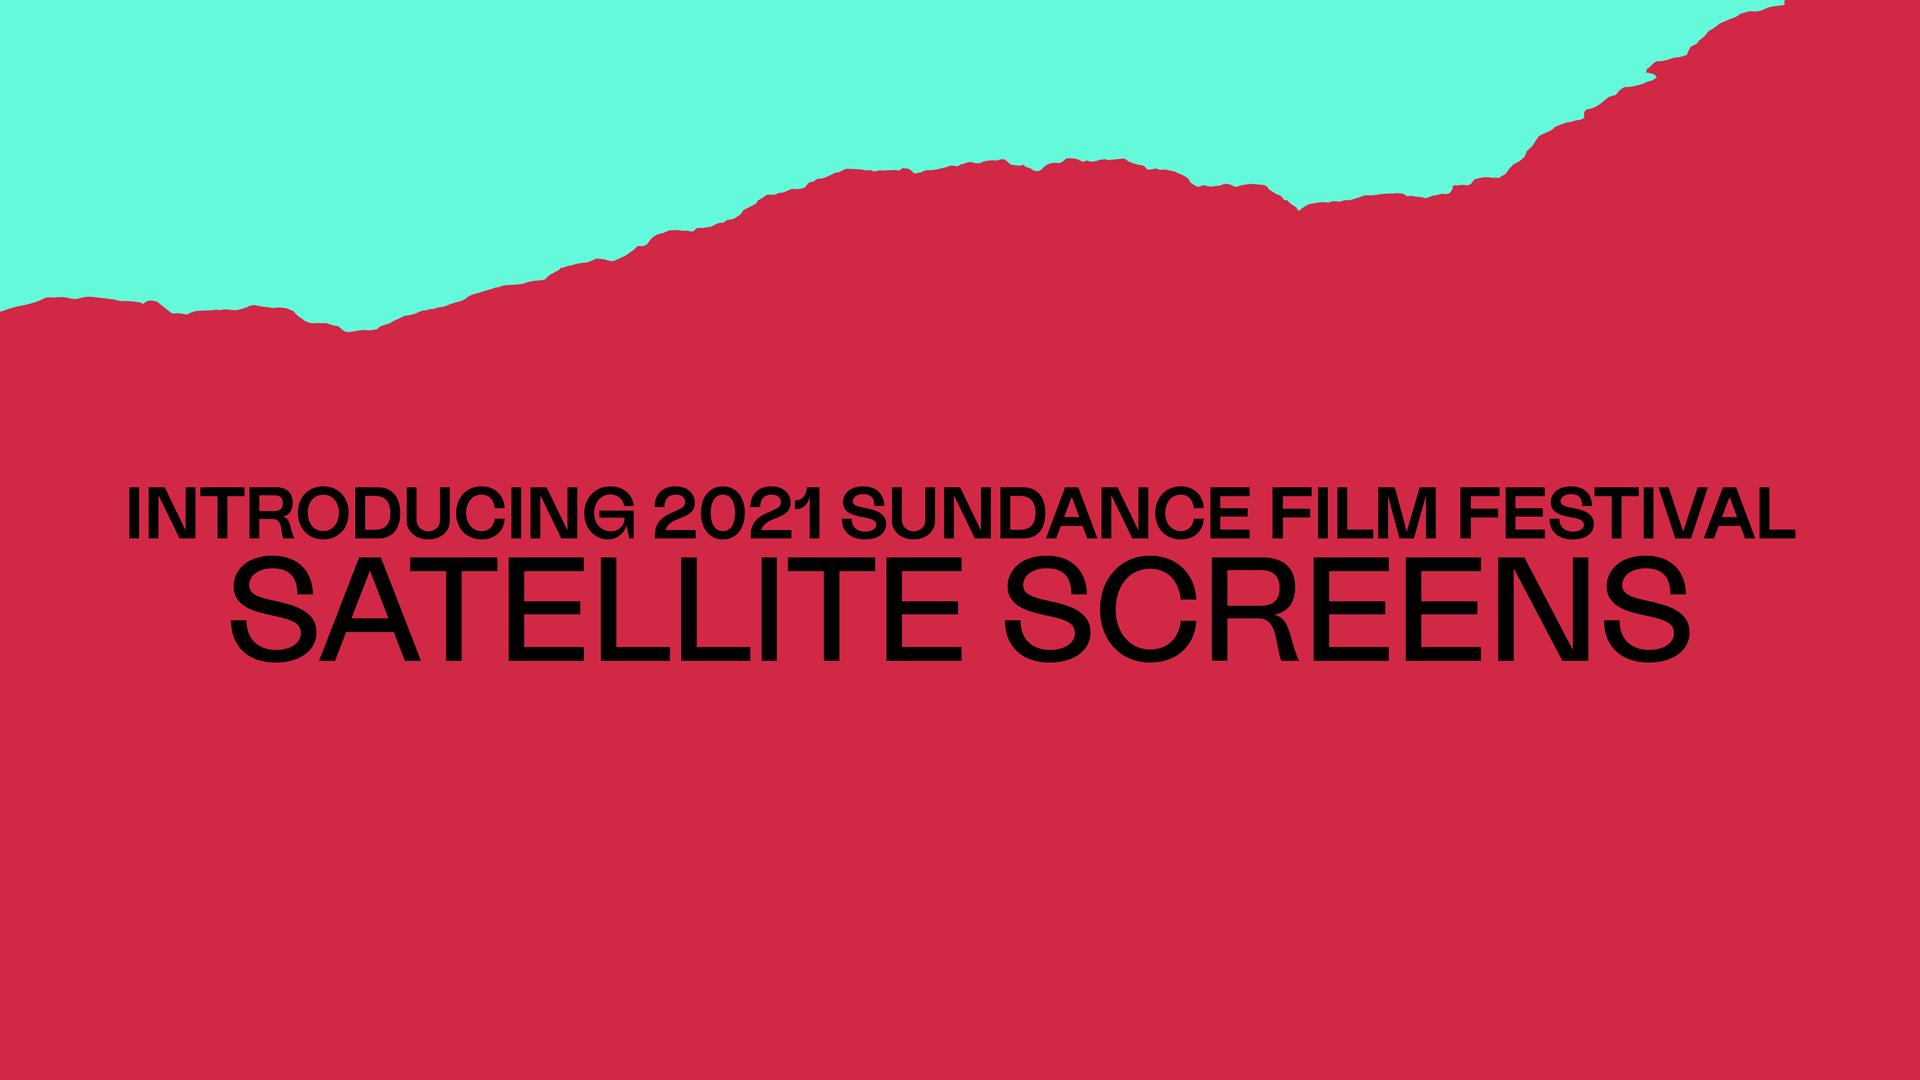 JBFC Partners for 2021 Sundance Film Festival As Sole New York-Area Satellite Screen